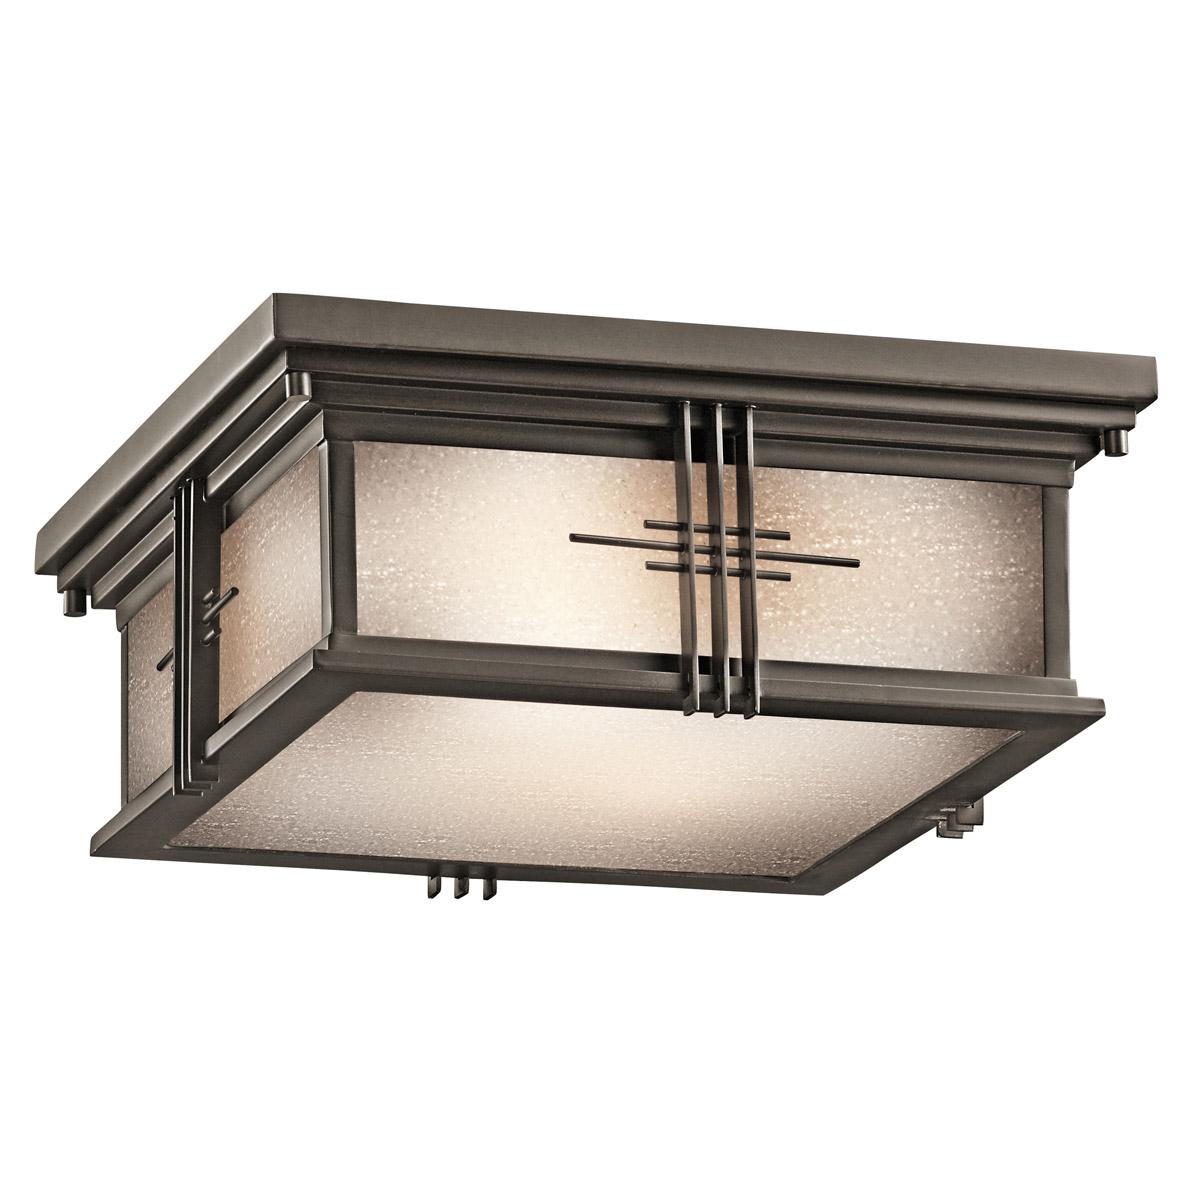 Mission Style Ceiling Light Fixtures Alexsullivanfund